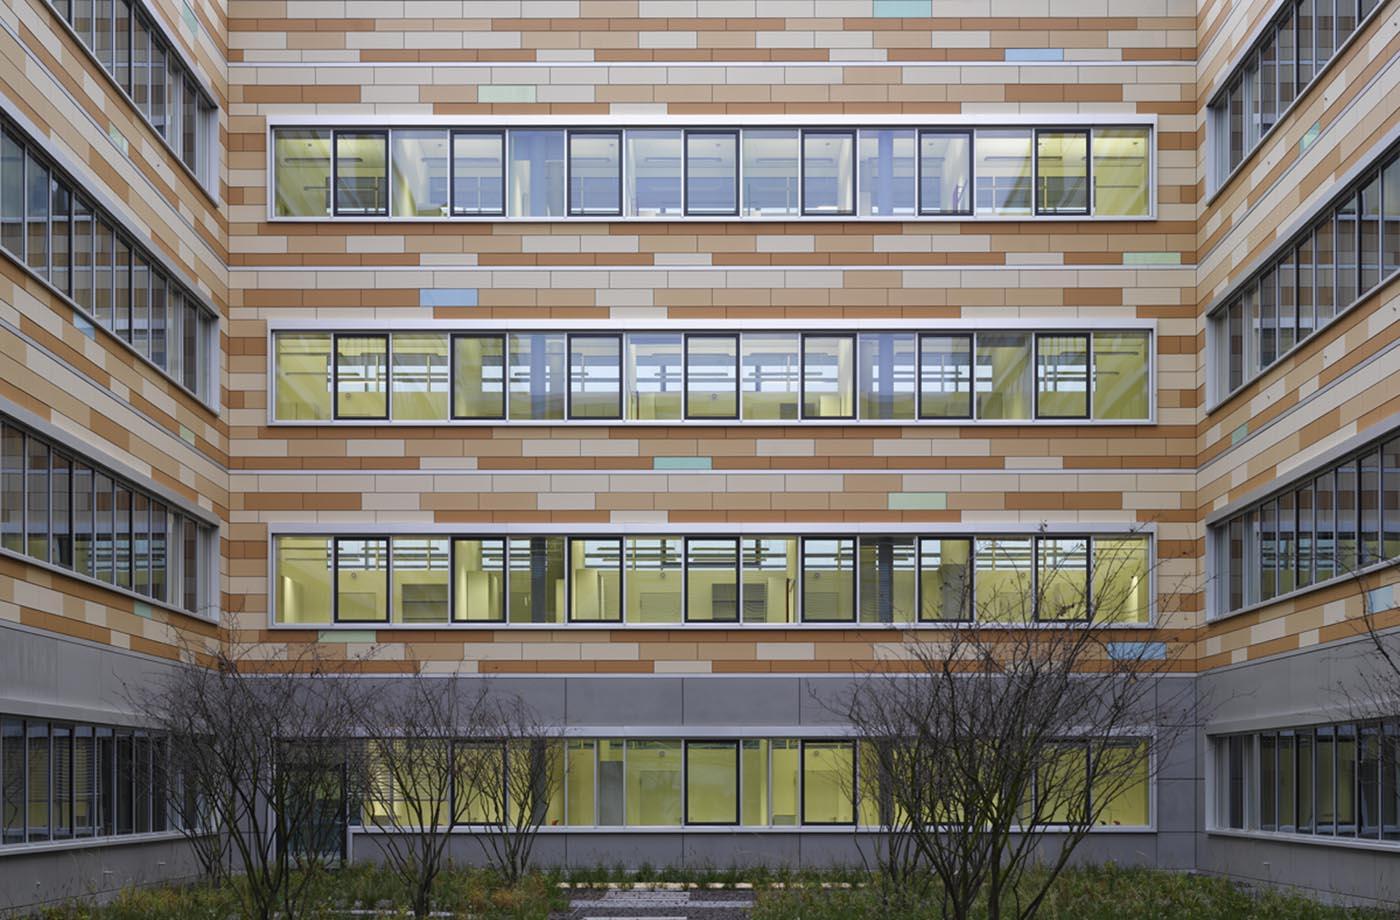 Max-Planck Institut für Chemie